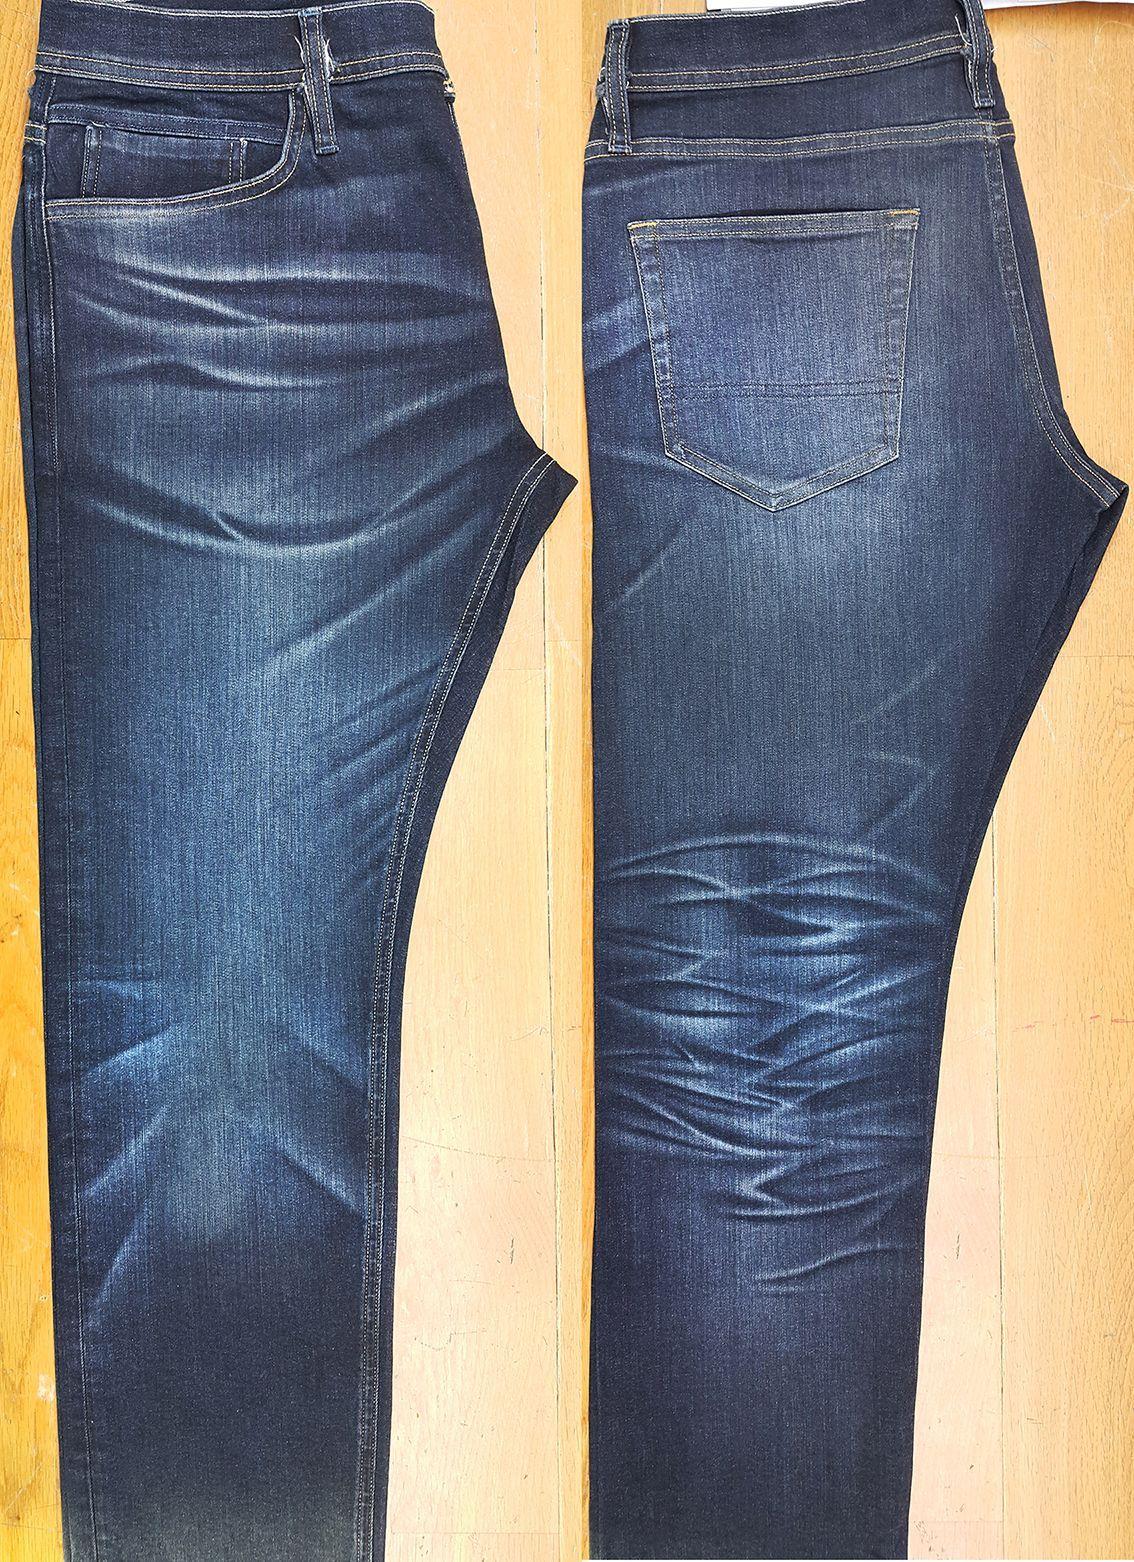 D8d2169dc71f2c8681b8c90d2482fe68 Jpg 1 134 1 562 Piksel Pantalones De Hombre Moda Jeans De Moda Pantalones Vaqueros Hombre